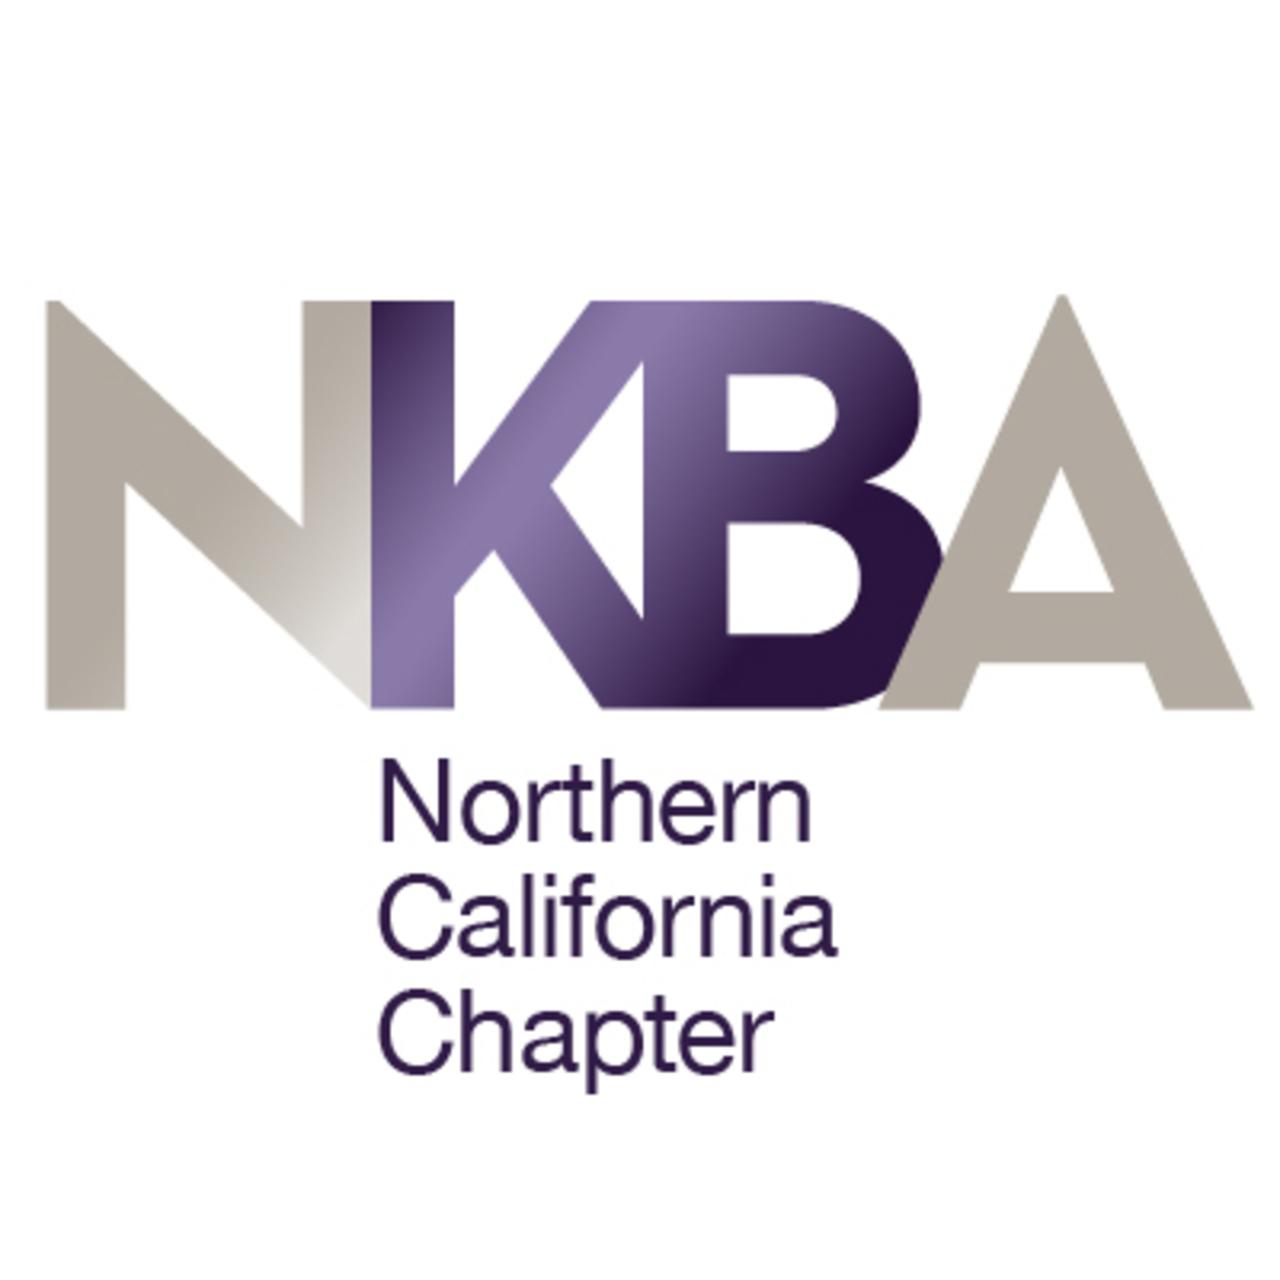 NKBA Northern California Chapter